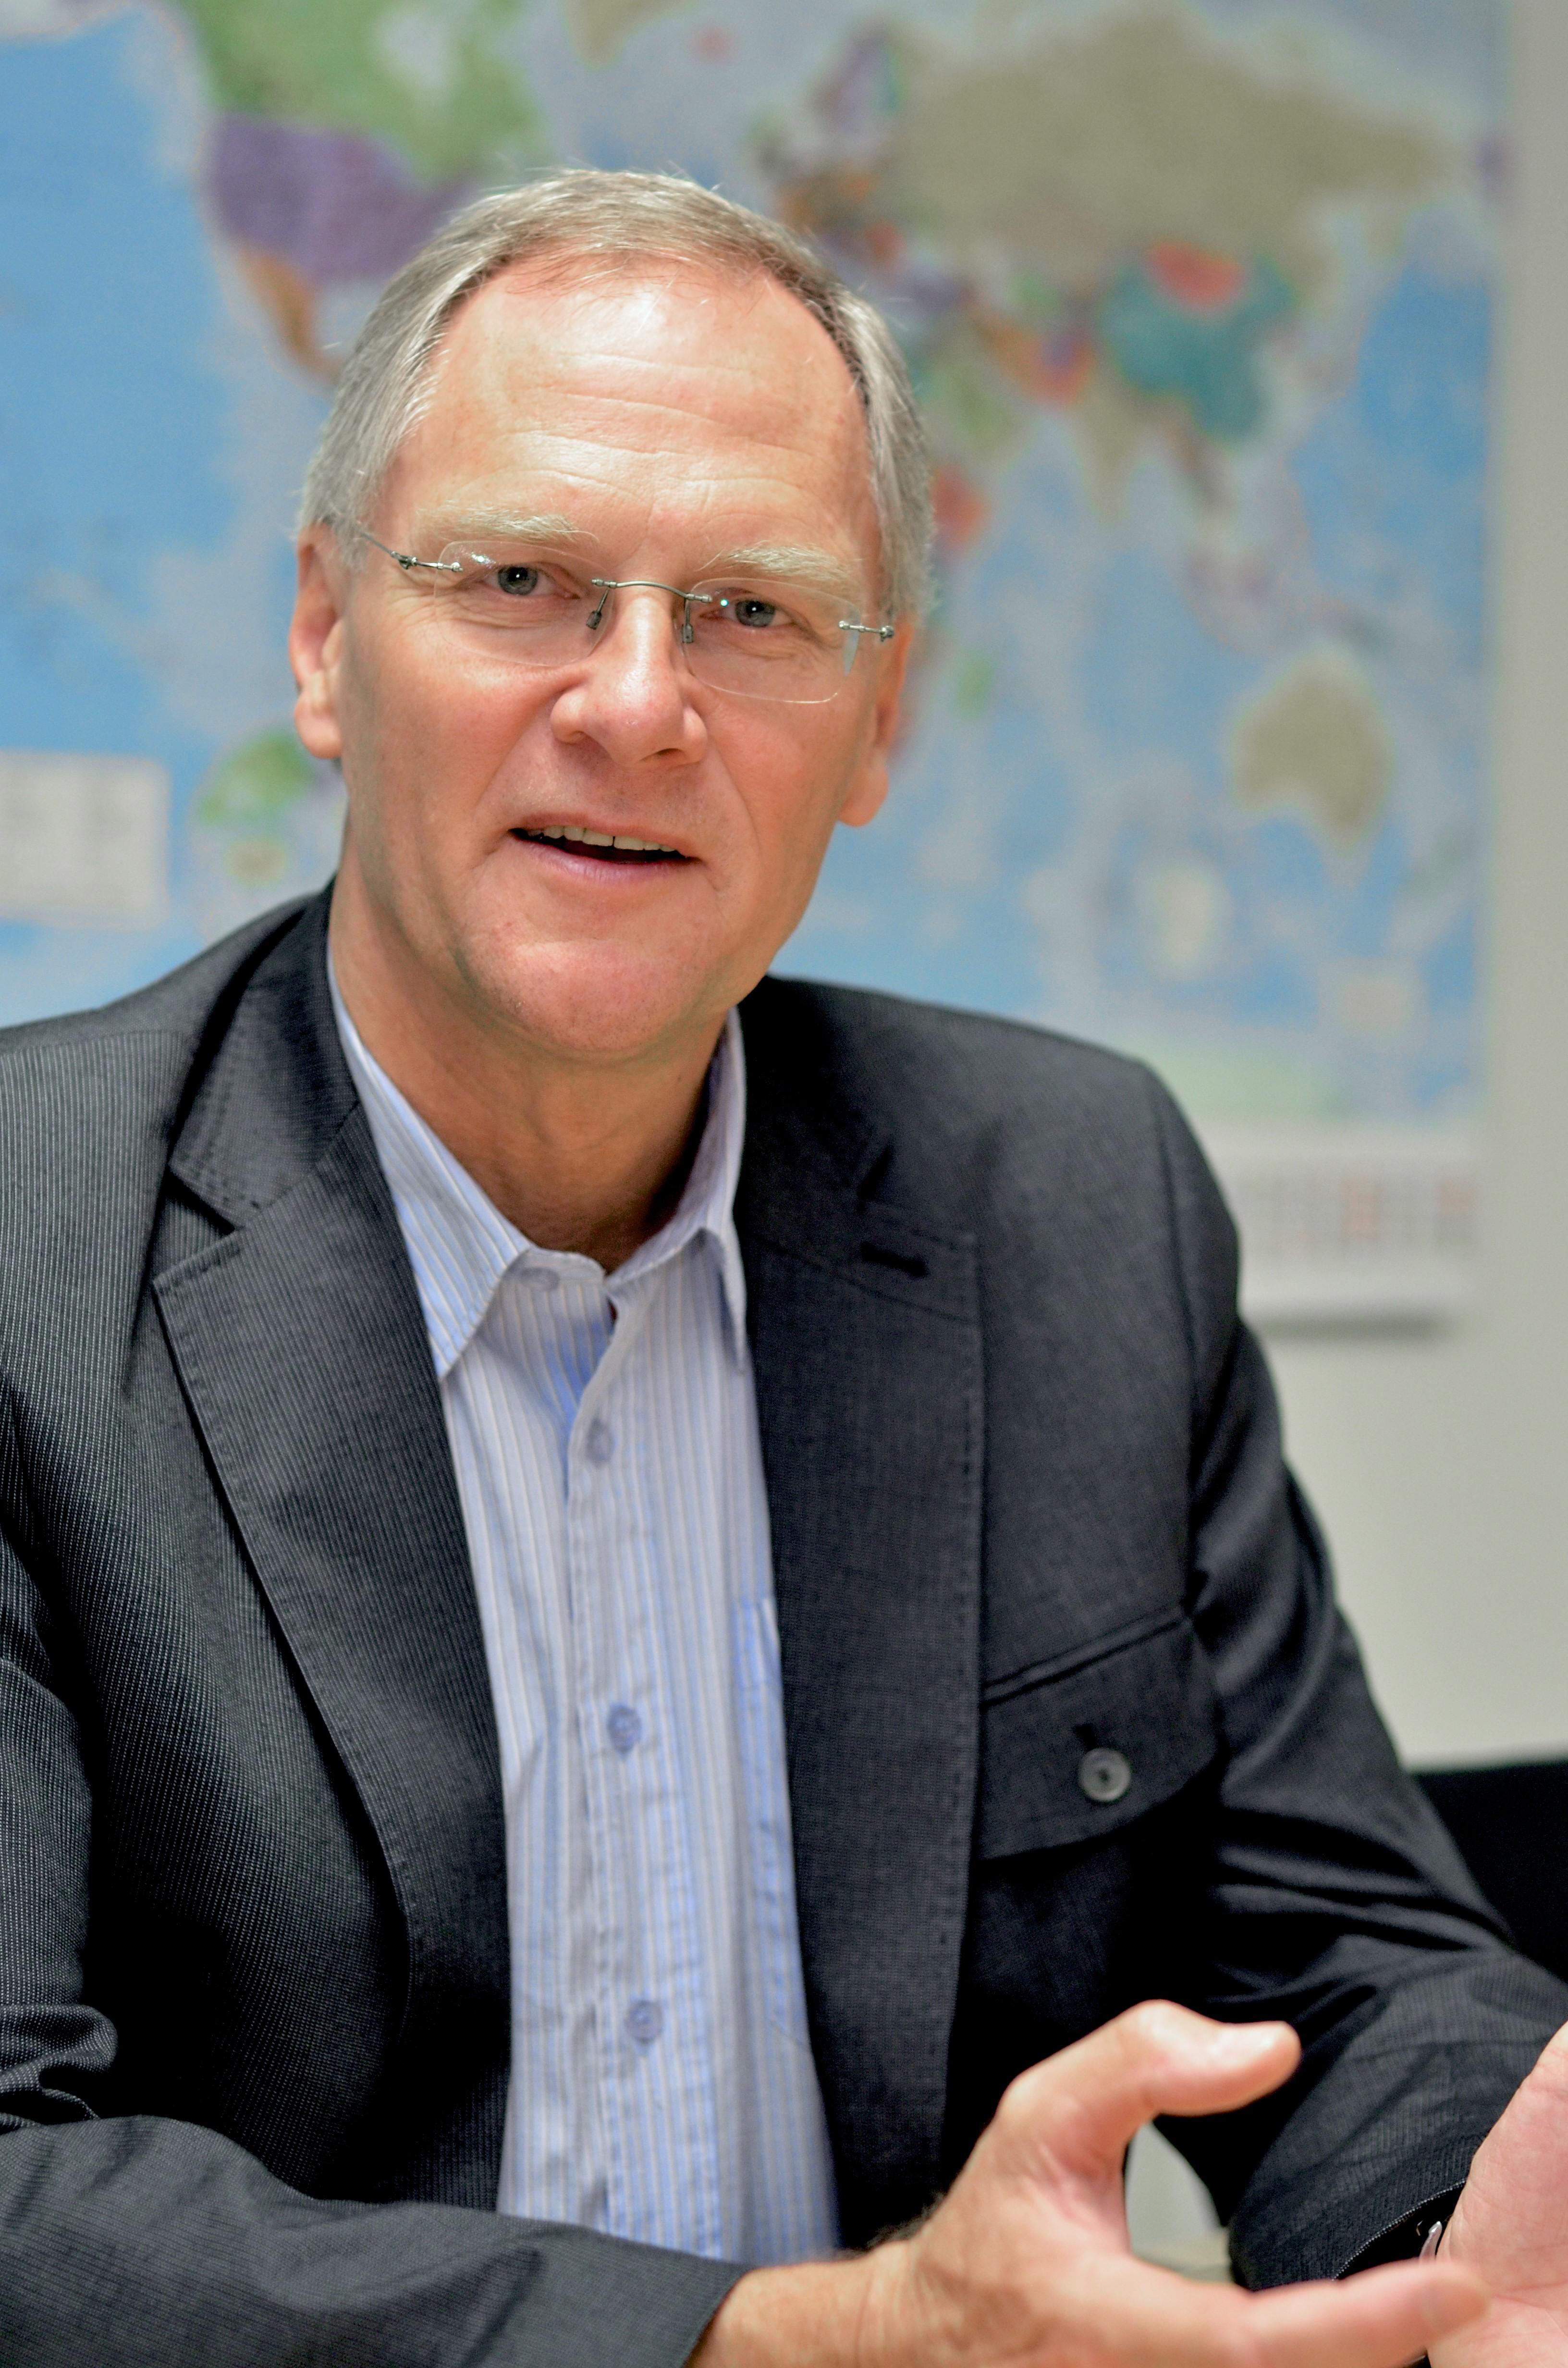 Per Møller-Pedersen